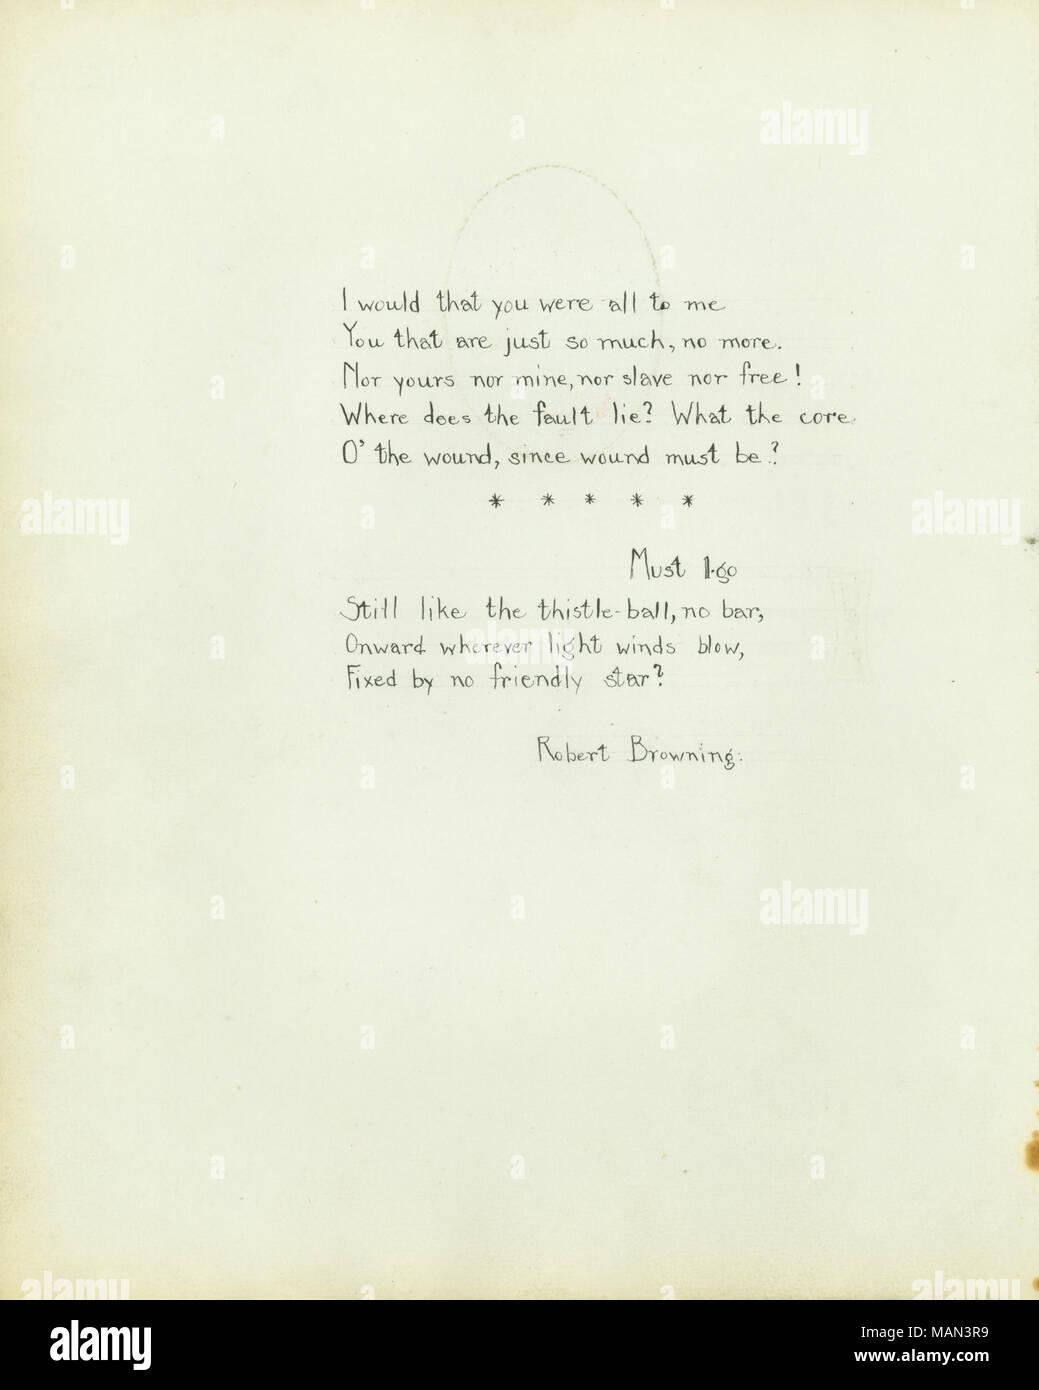 Poesia Di Robert Browning Titoloil Tornio Del Vasaio Volume 2